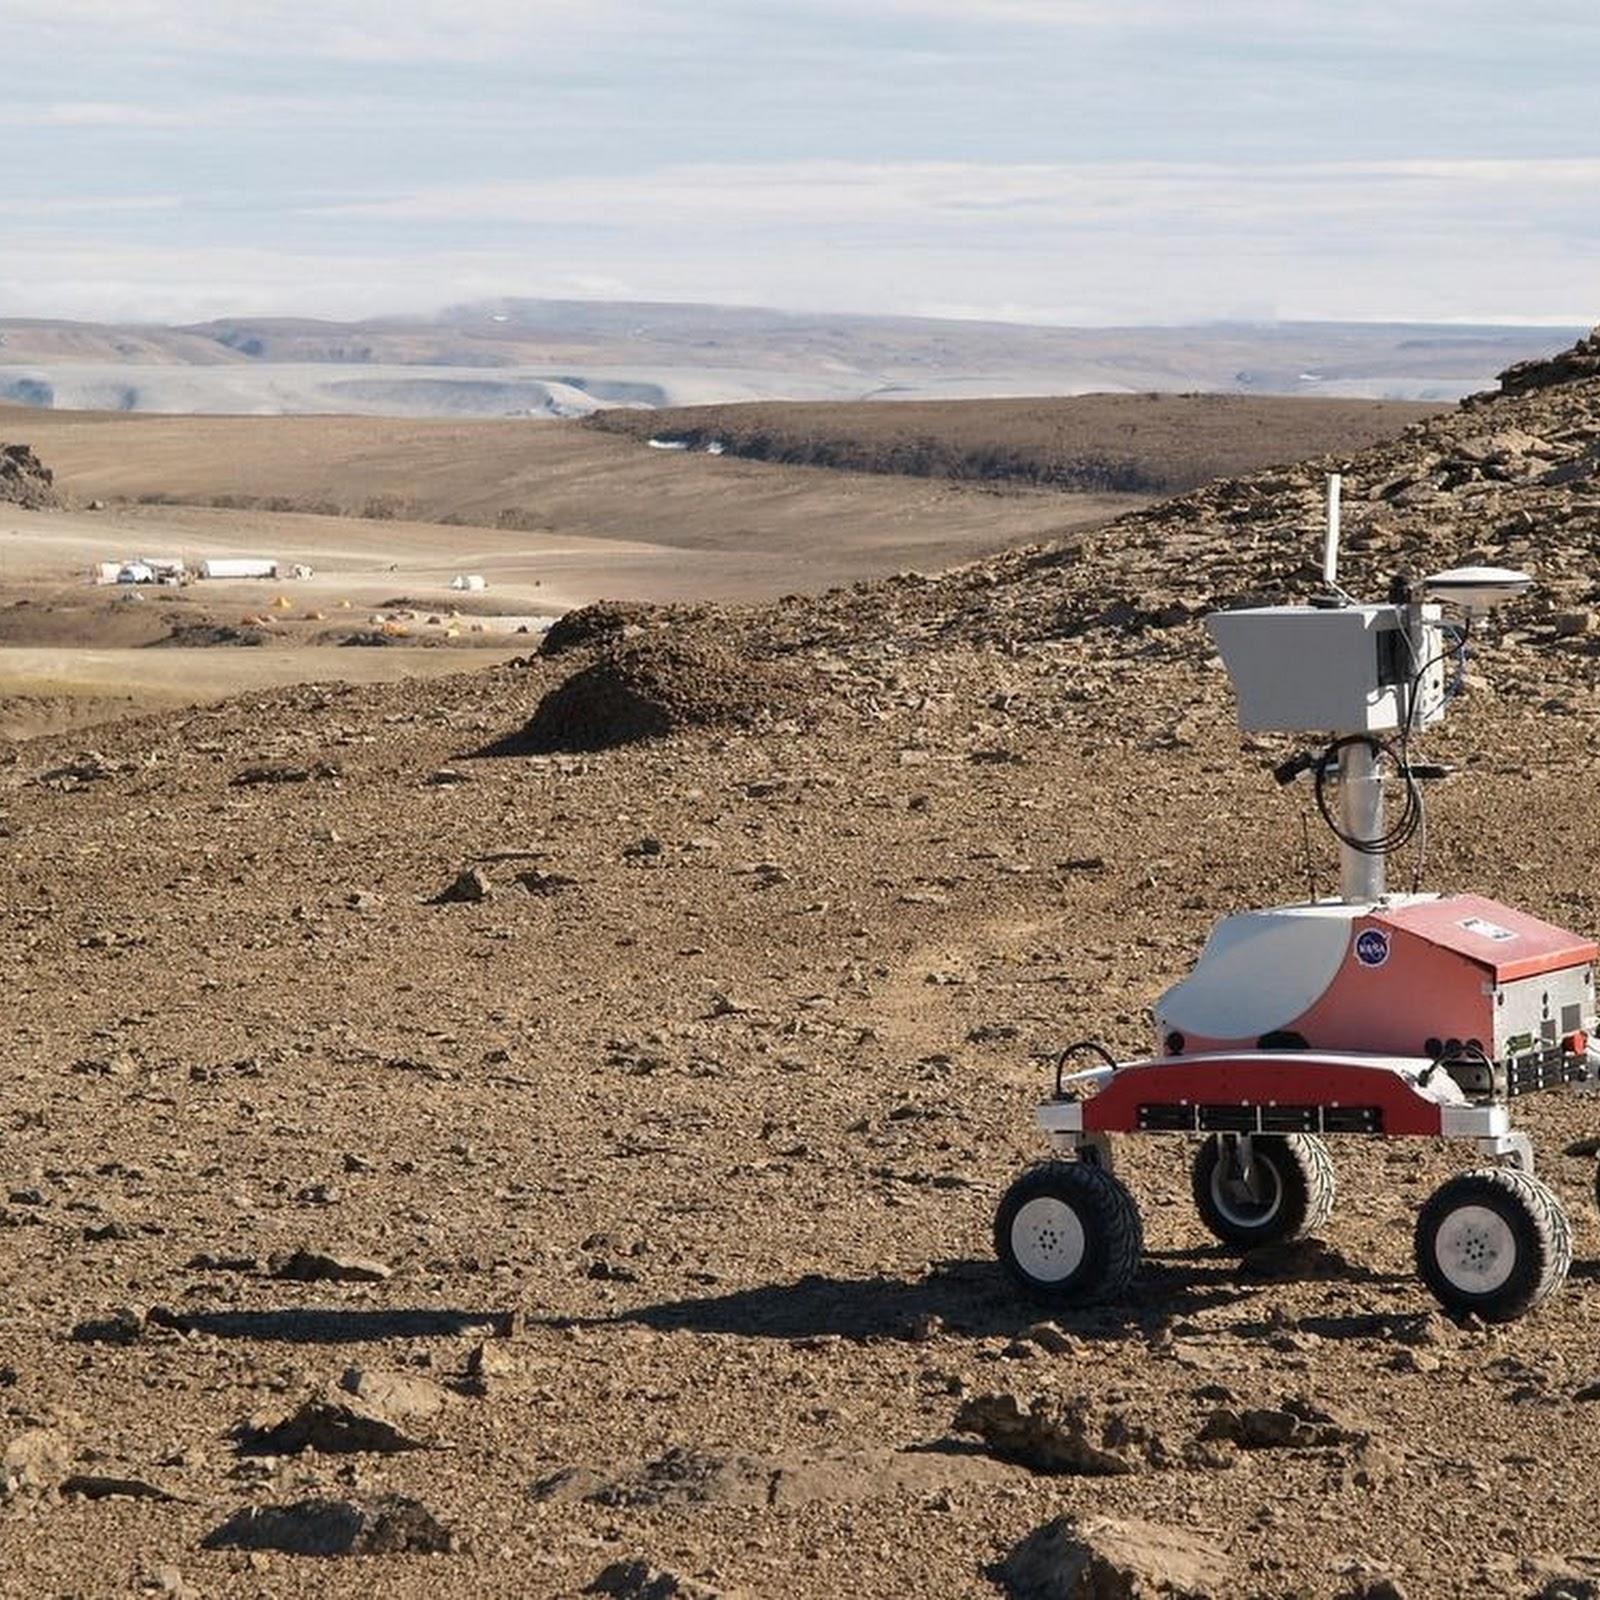 Devon Island: Mars on Earth